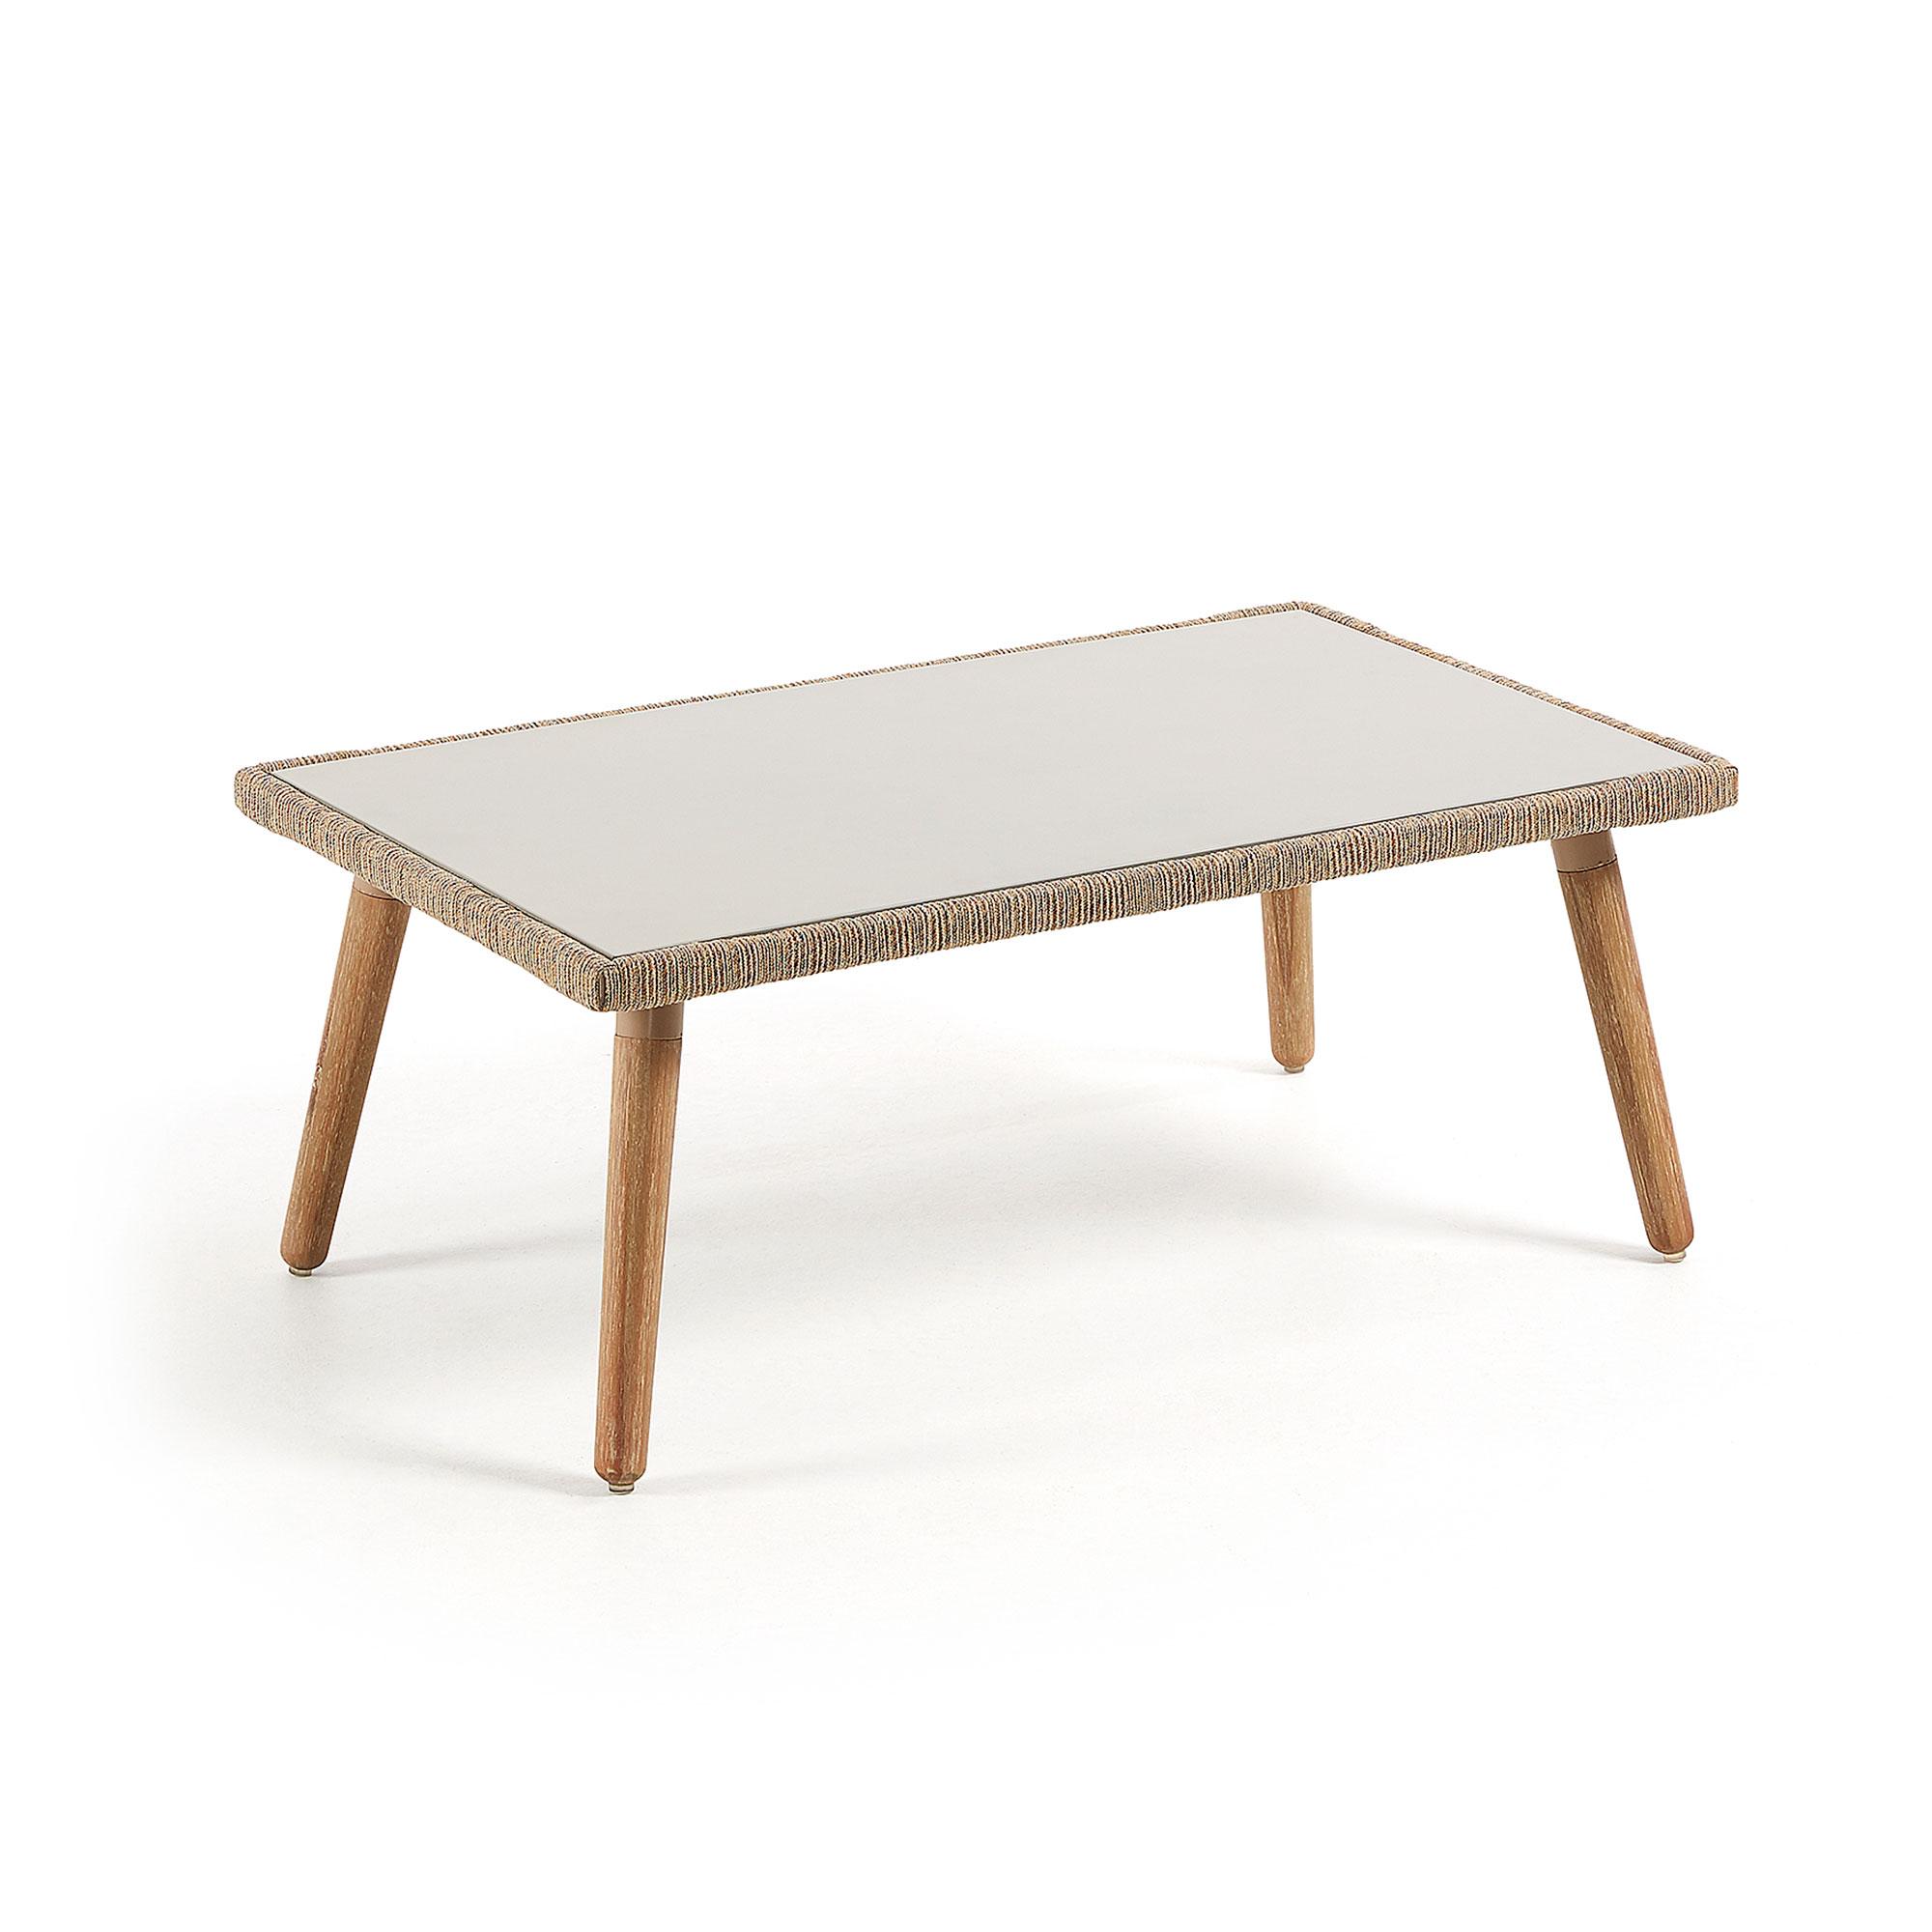 laforma – Laforma gillian sofabord - lysegrå/natur polycement/eukalyptustræ, rektangulær (100x60) fra boboonline.dk